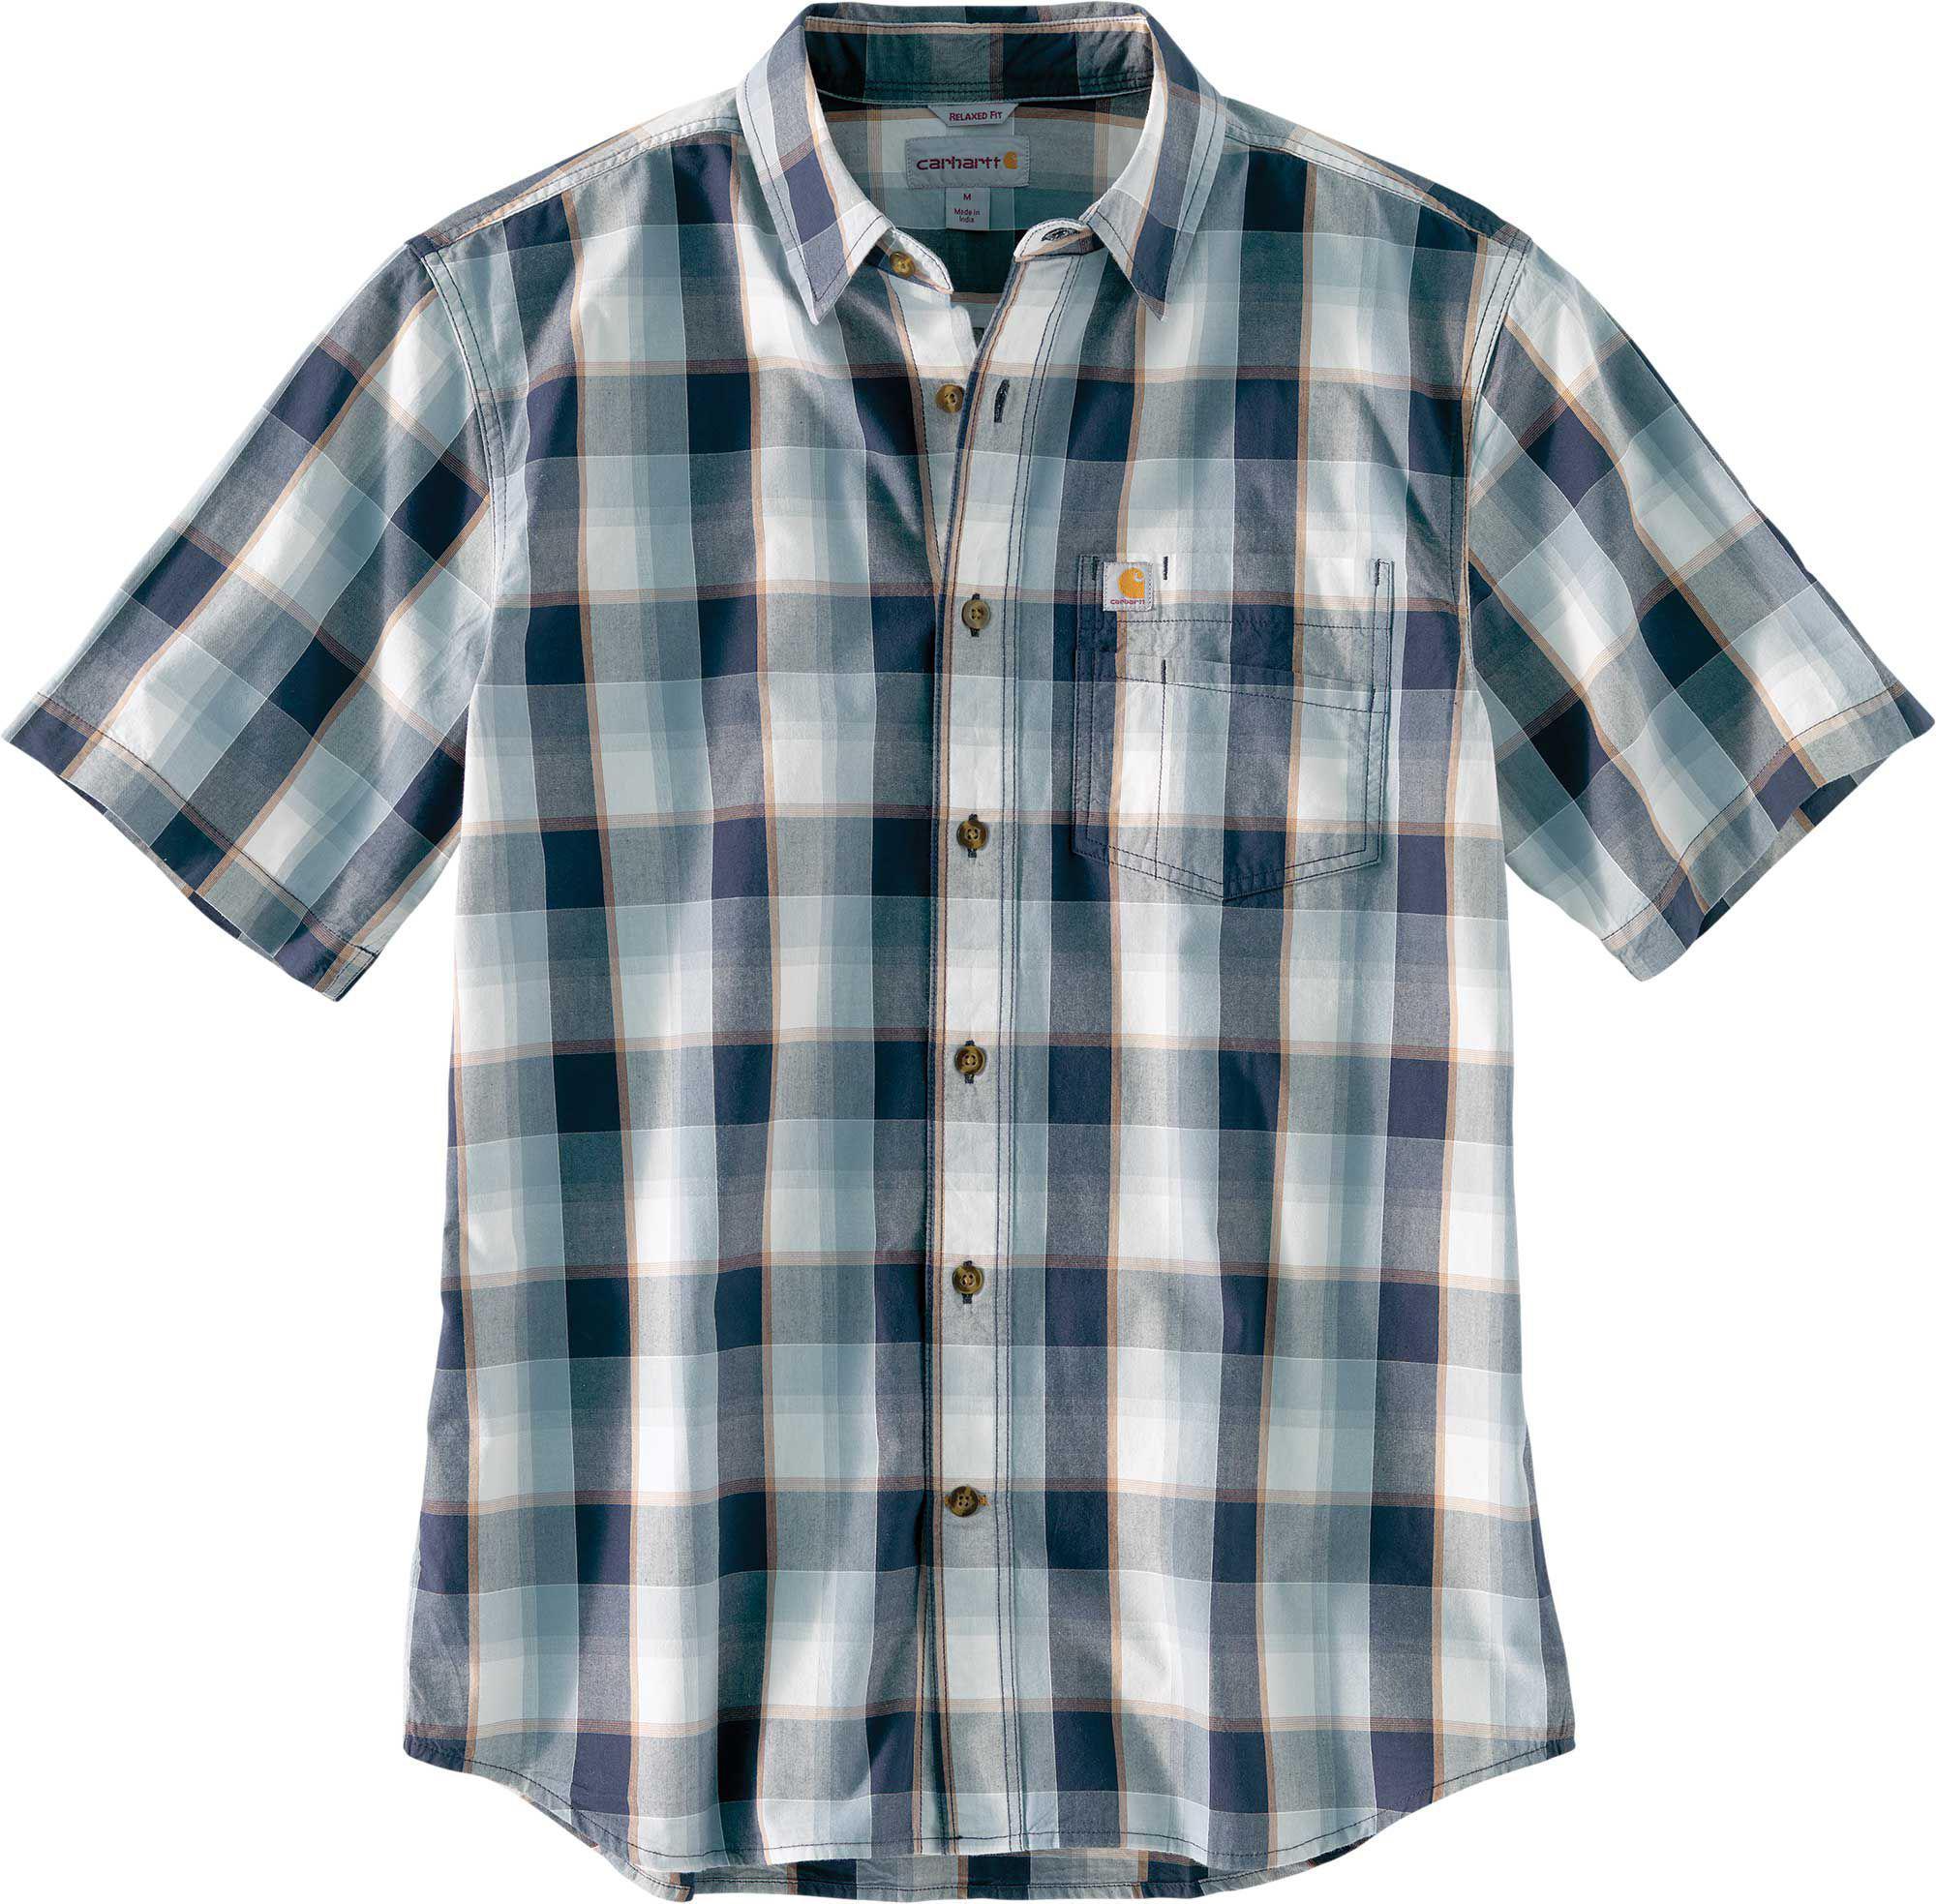 31f03cdbd49 Carhartt. Men s Blue Essential Plaid Open Collar Short Sleeve Button Down  Shirt